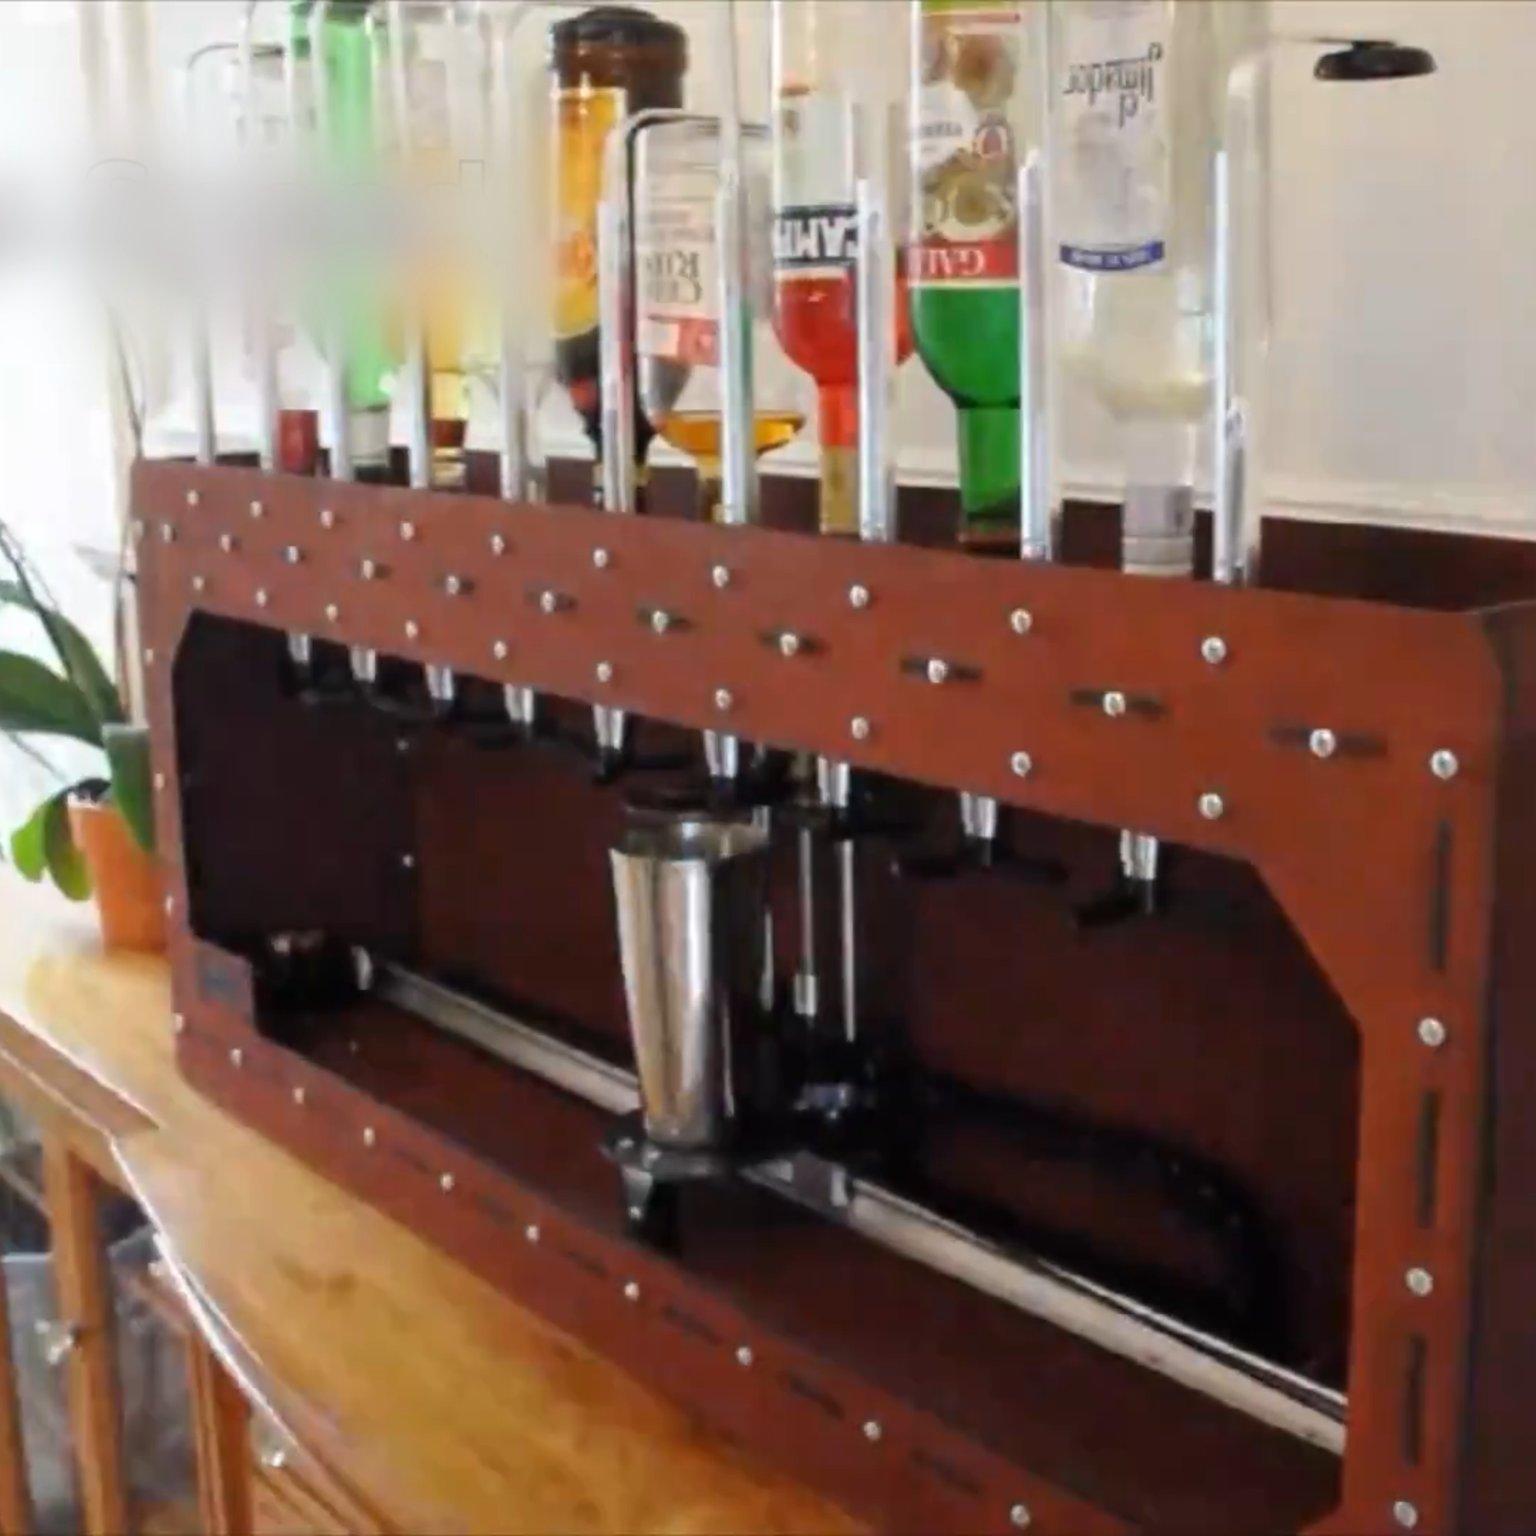 Rose Dynamics Coaster 'Drink Induction Chiller' Keeps Drinks